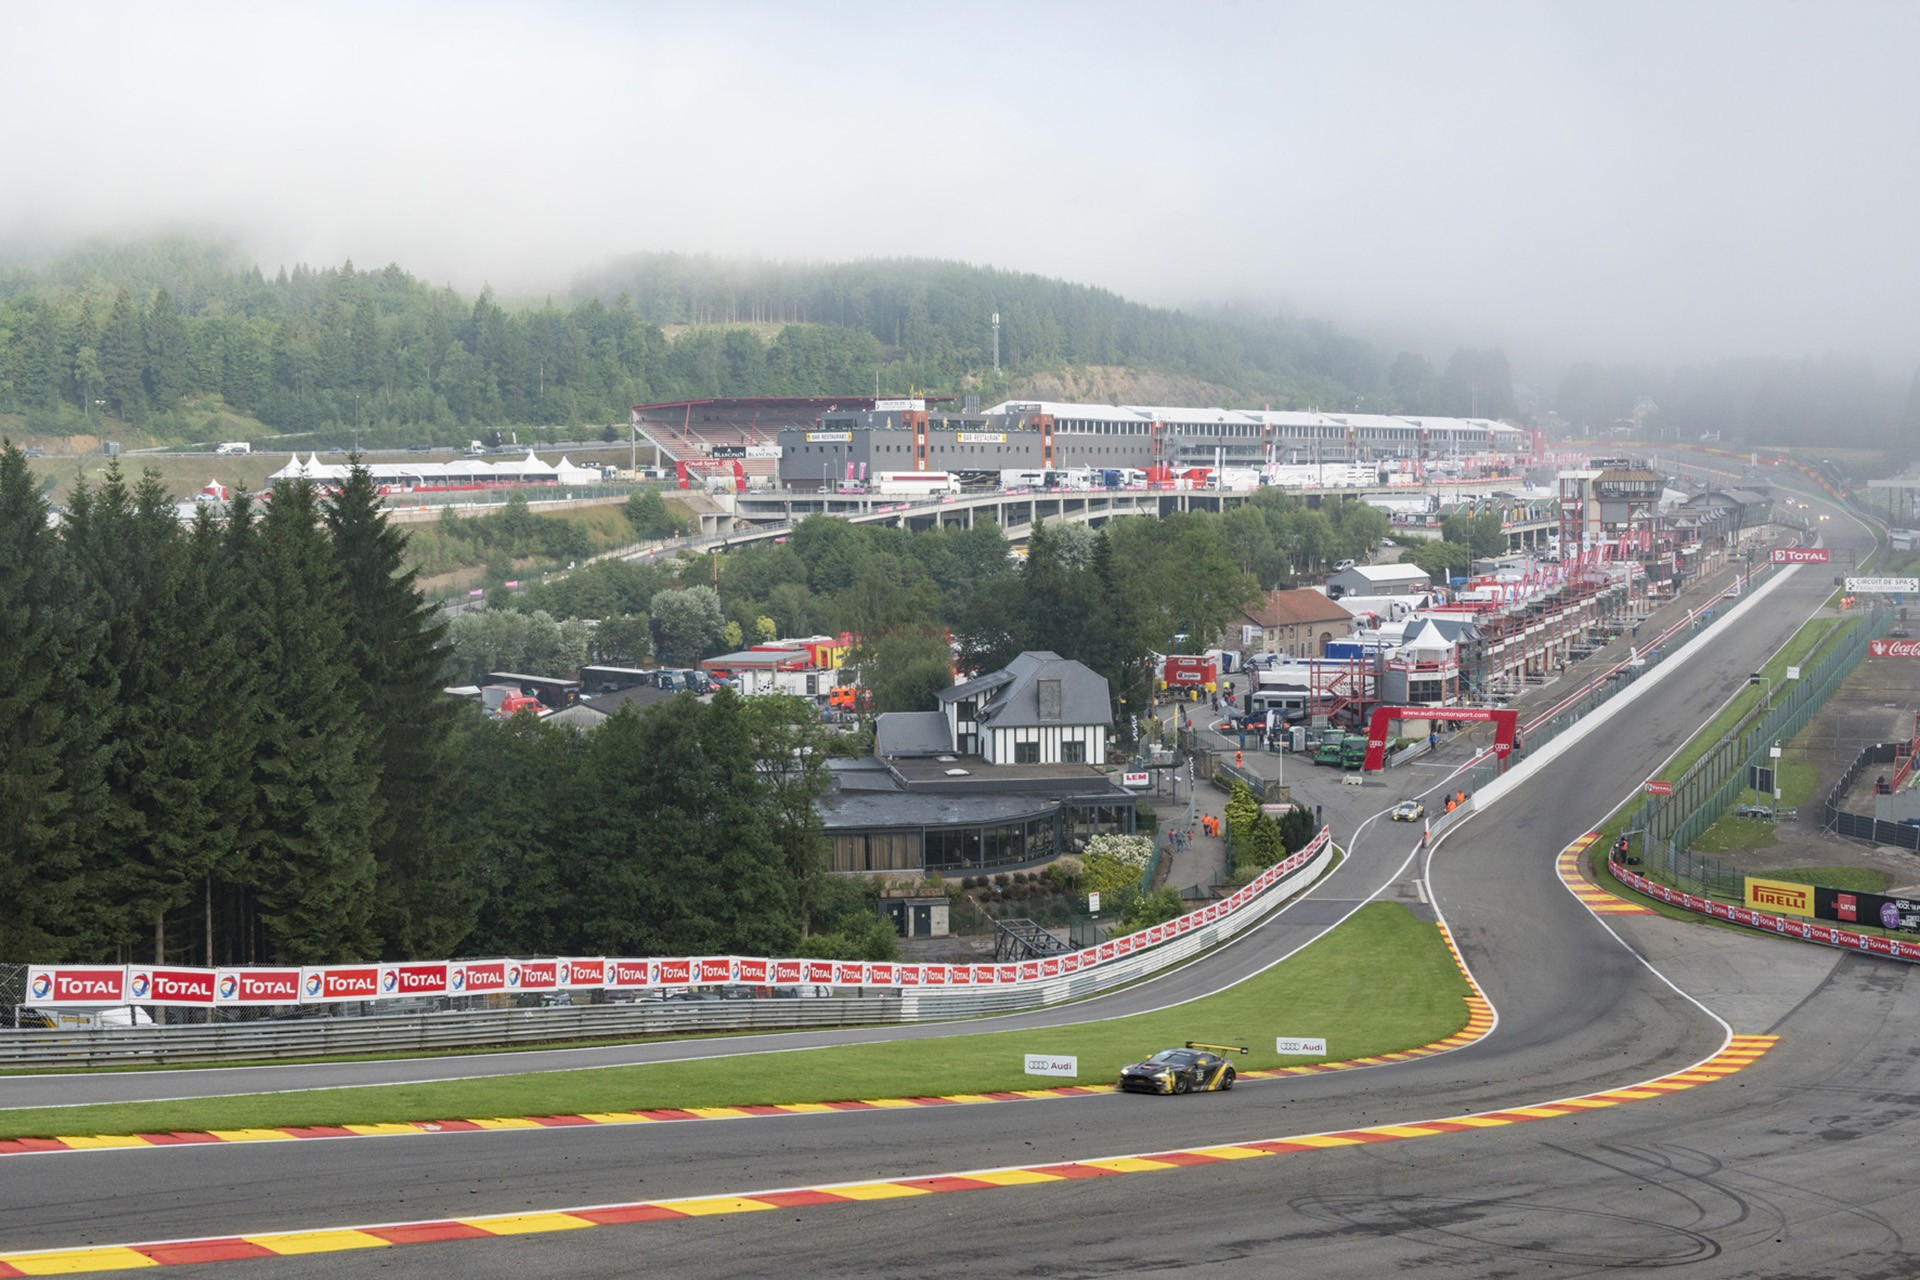 Circuit de Spa-Francorchamps - Total 24 hours of Spa